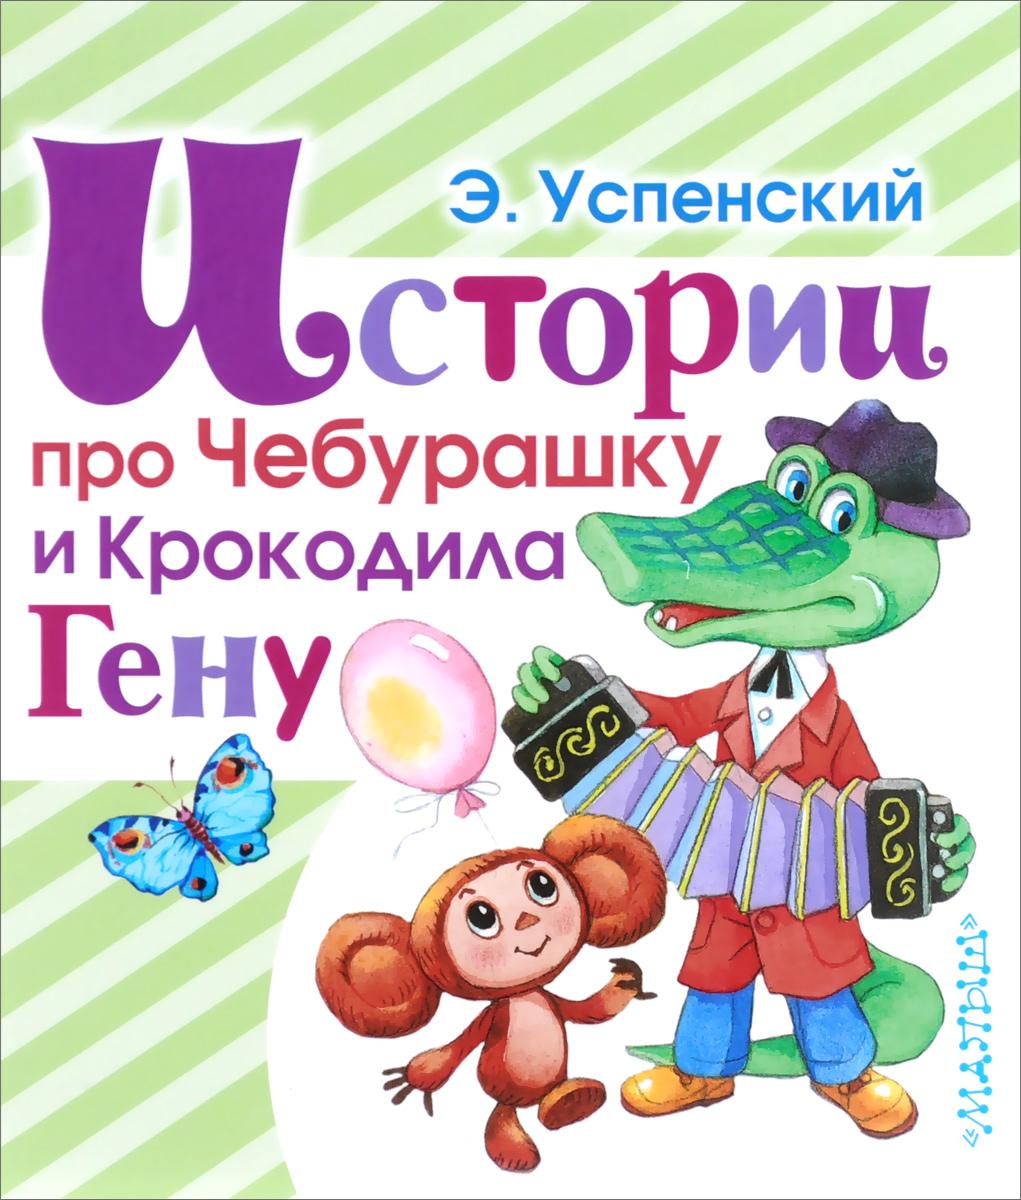 Э. Успенский Истории про Чебурашку и Крокодила Гену